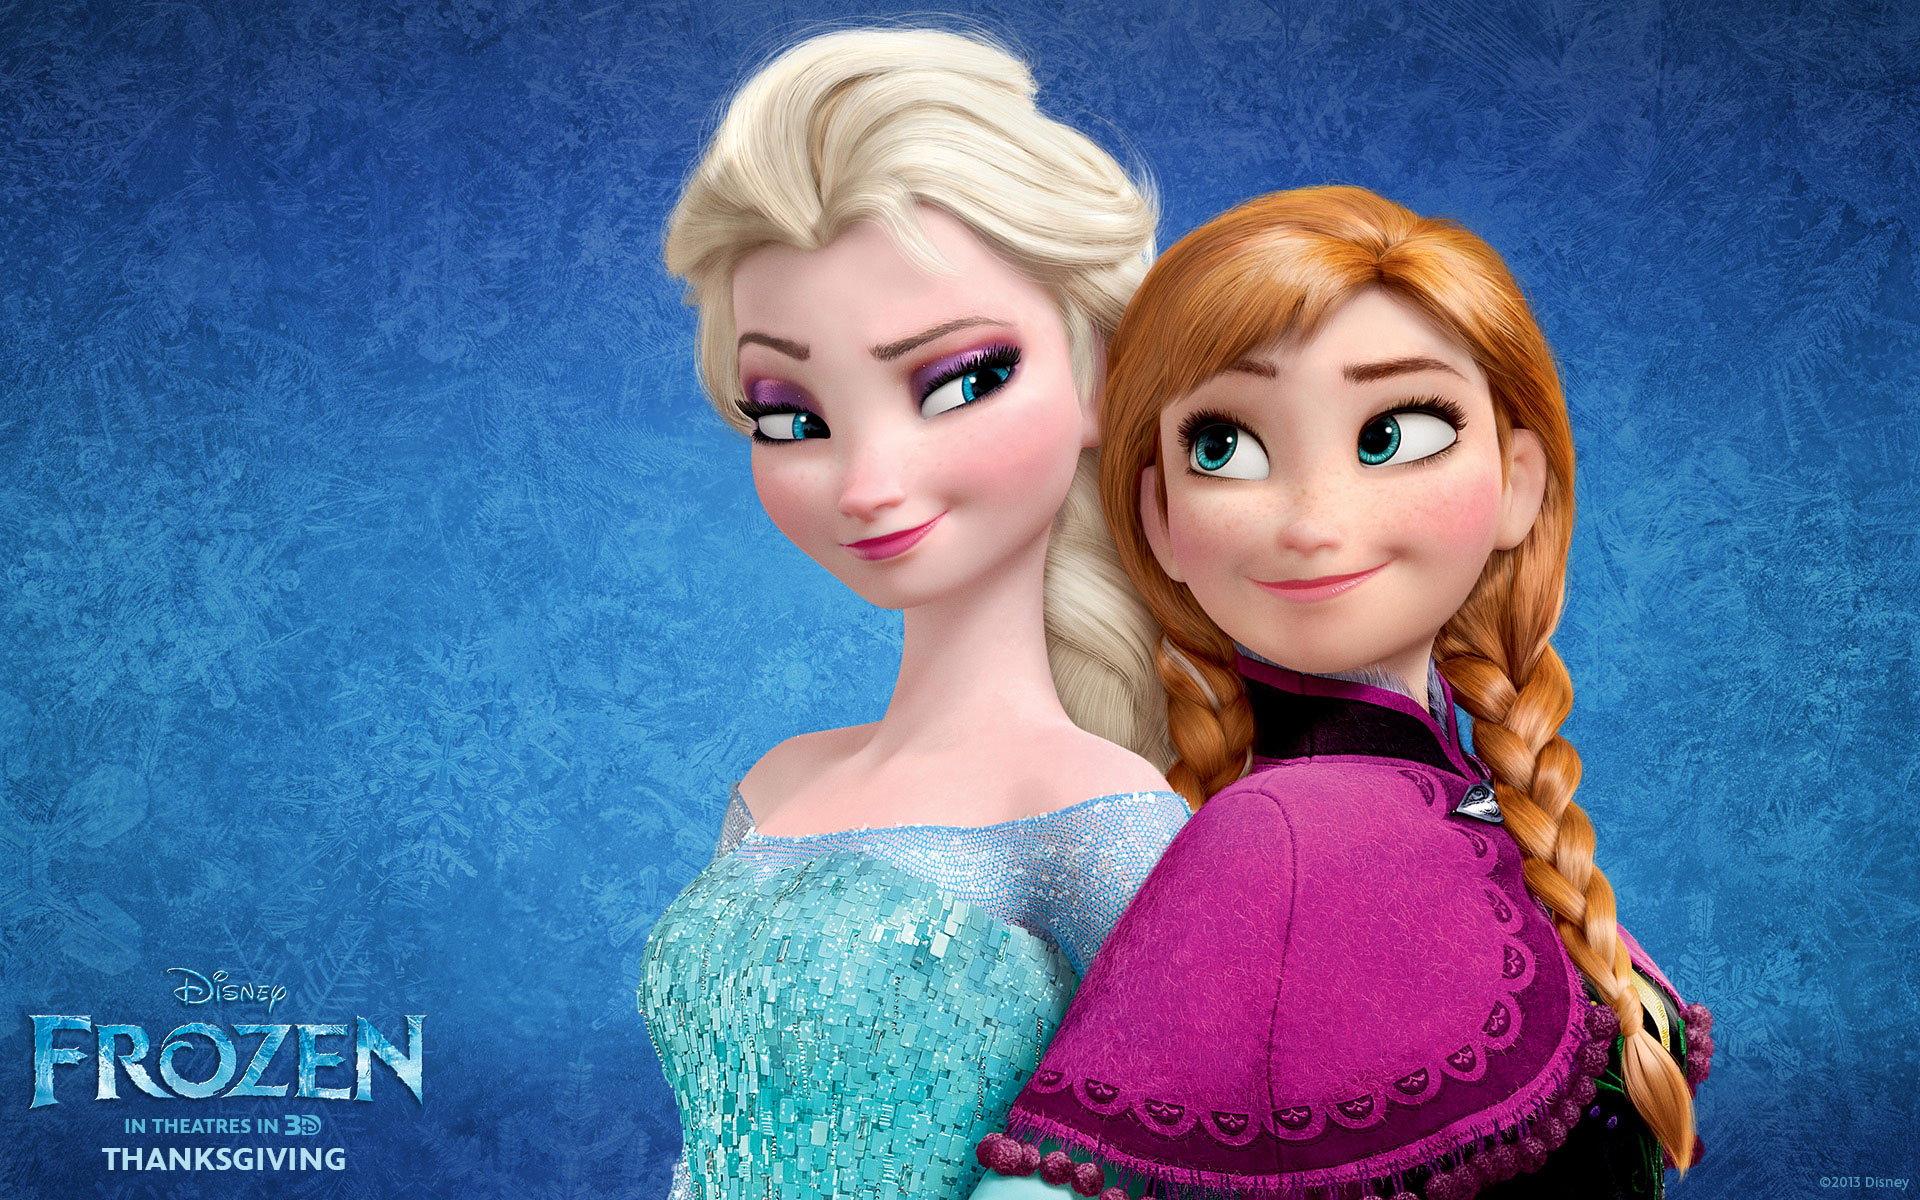 frozen 2013 movie wallpapers hd collection frozen movie anna elsa hd 1920x1200